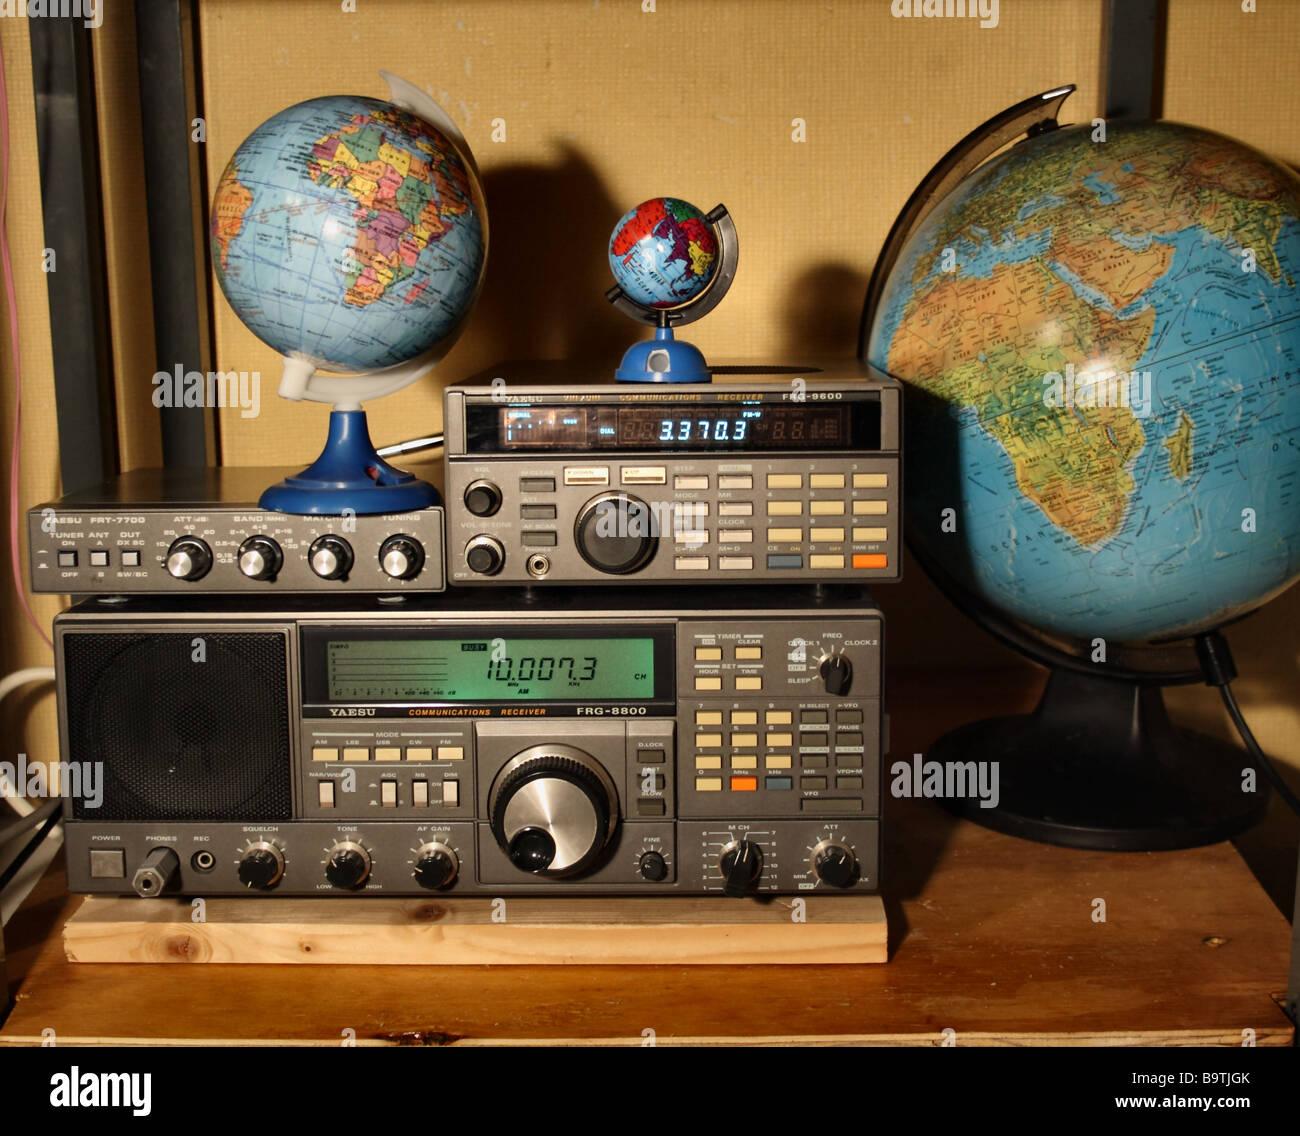 Shortwave Radio illustrates communication receivers